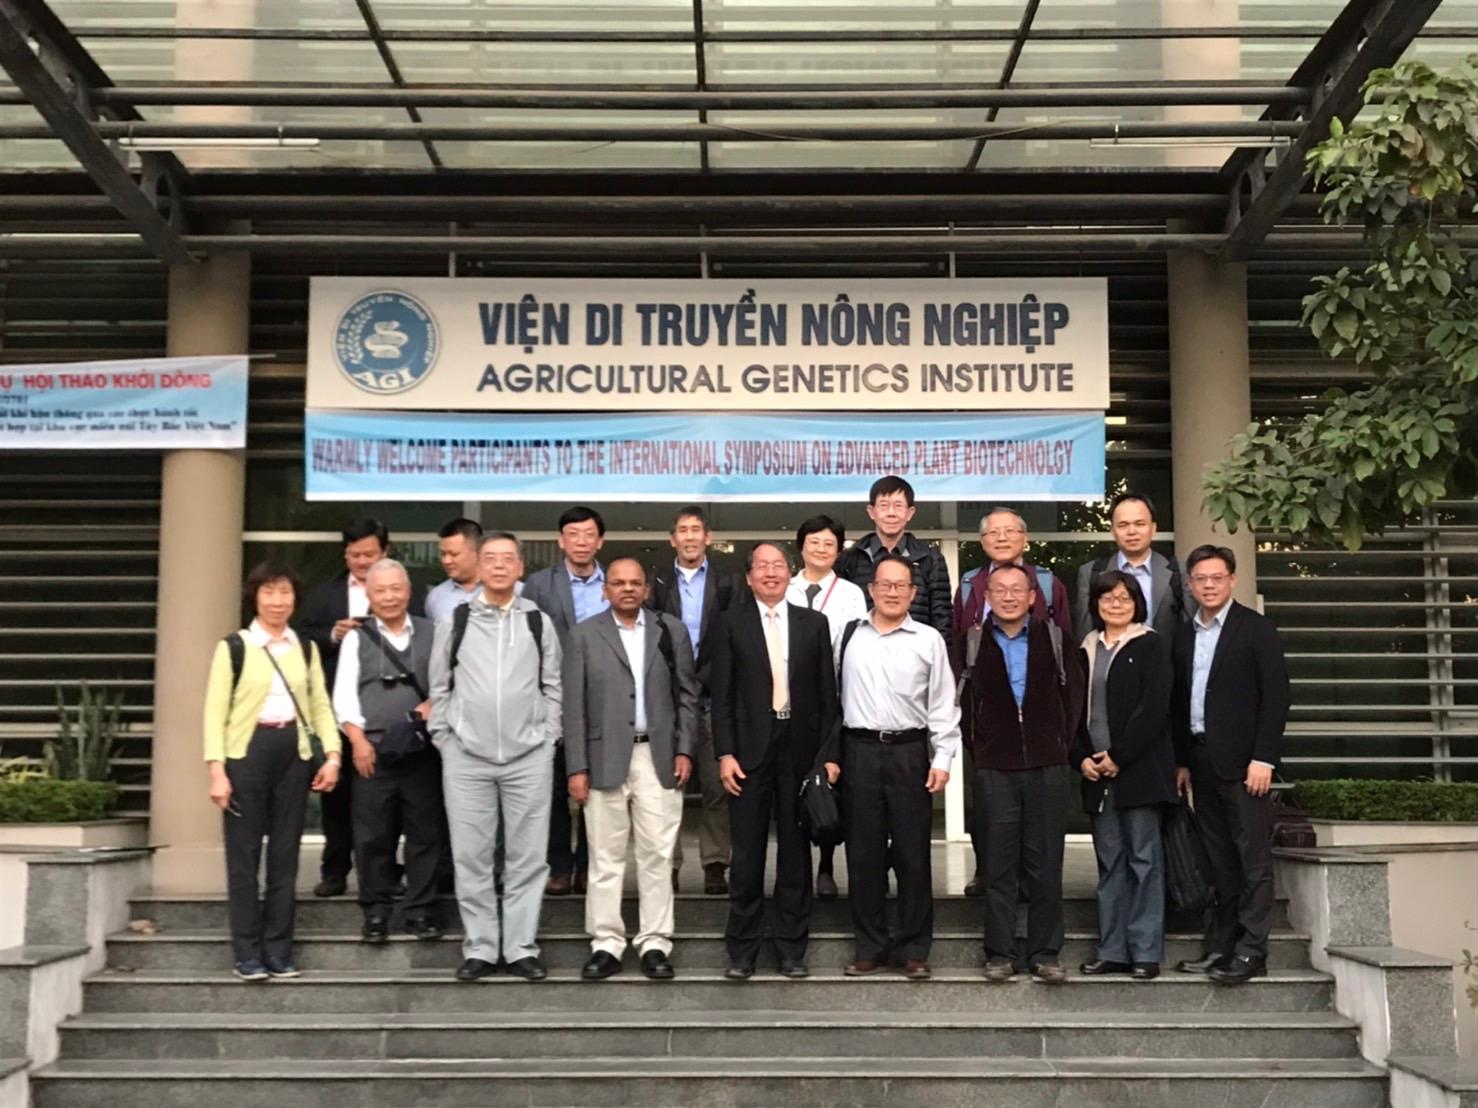 2019.12.05-12.07 International Symposium on Advanced Plant Biotechnology